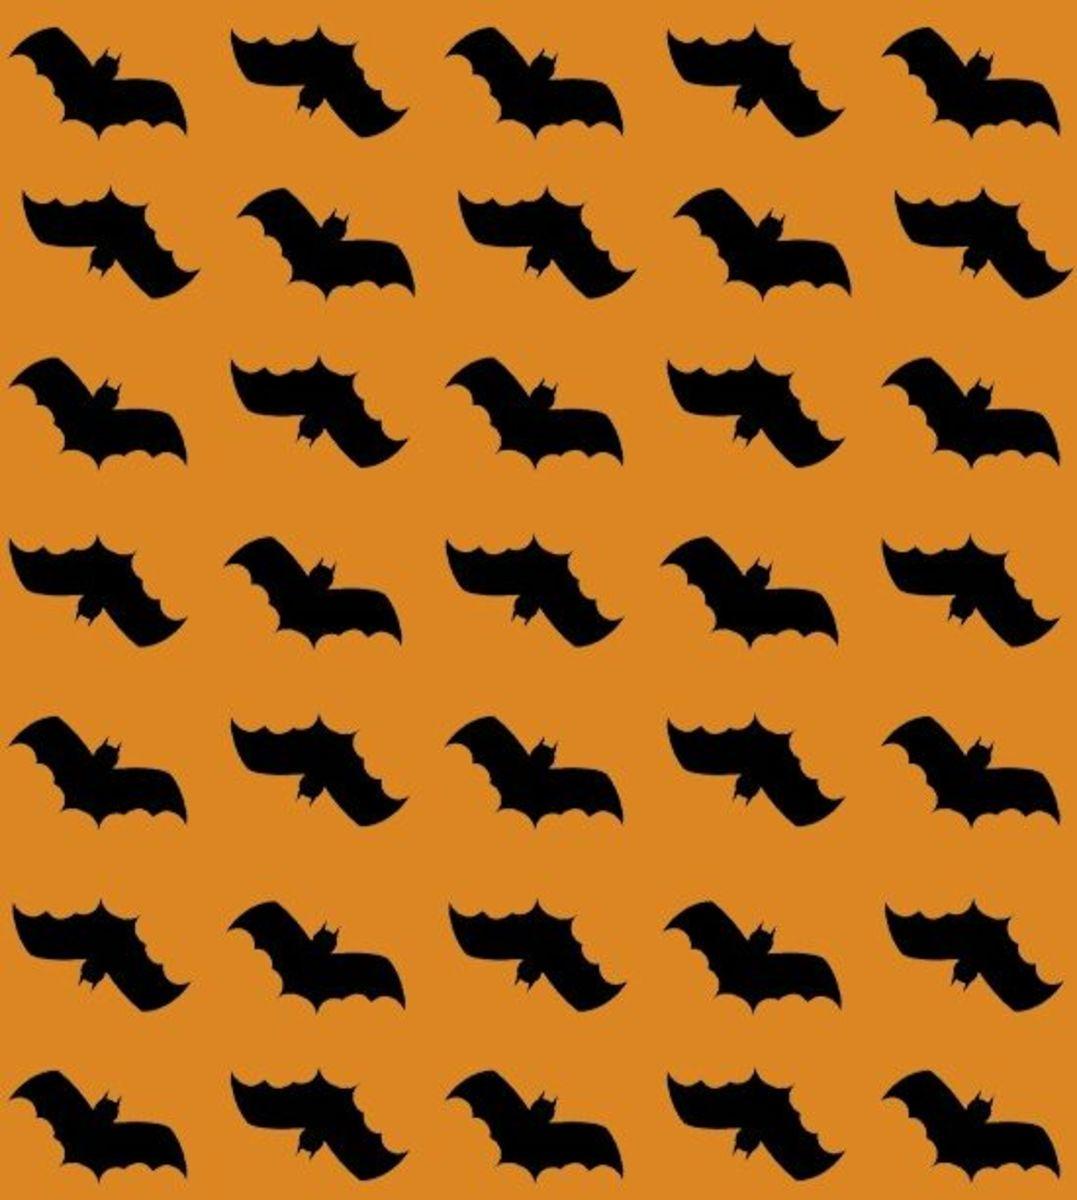 Printable Halloween vampire bats pattern black and orange.